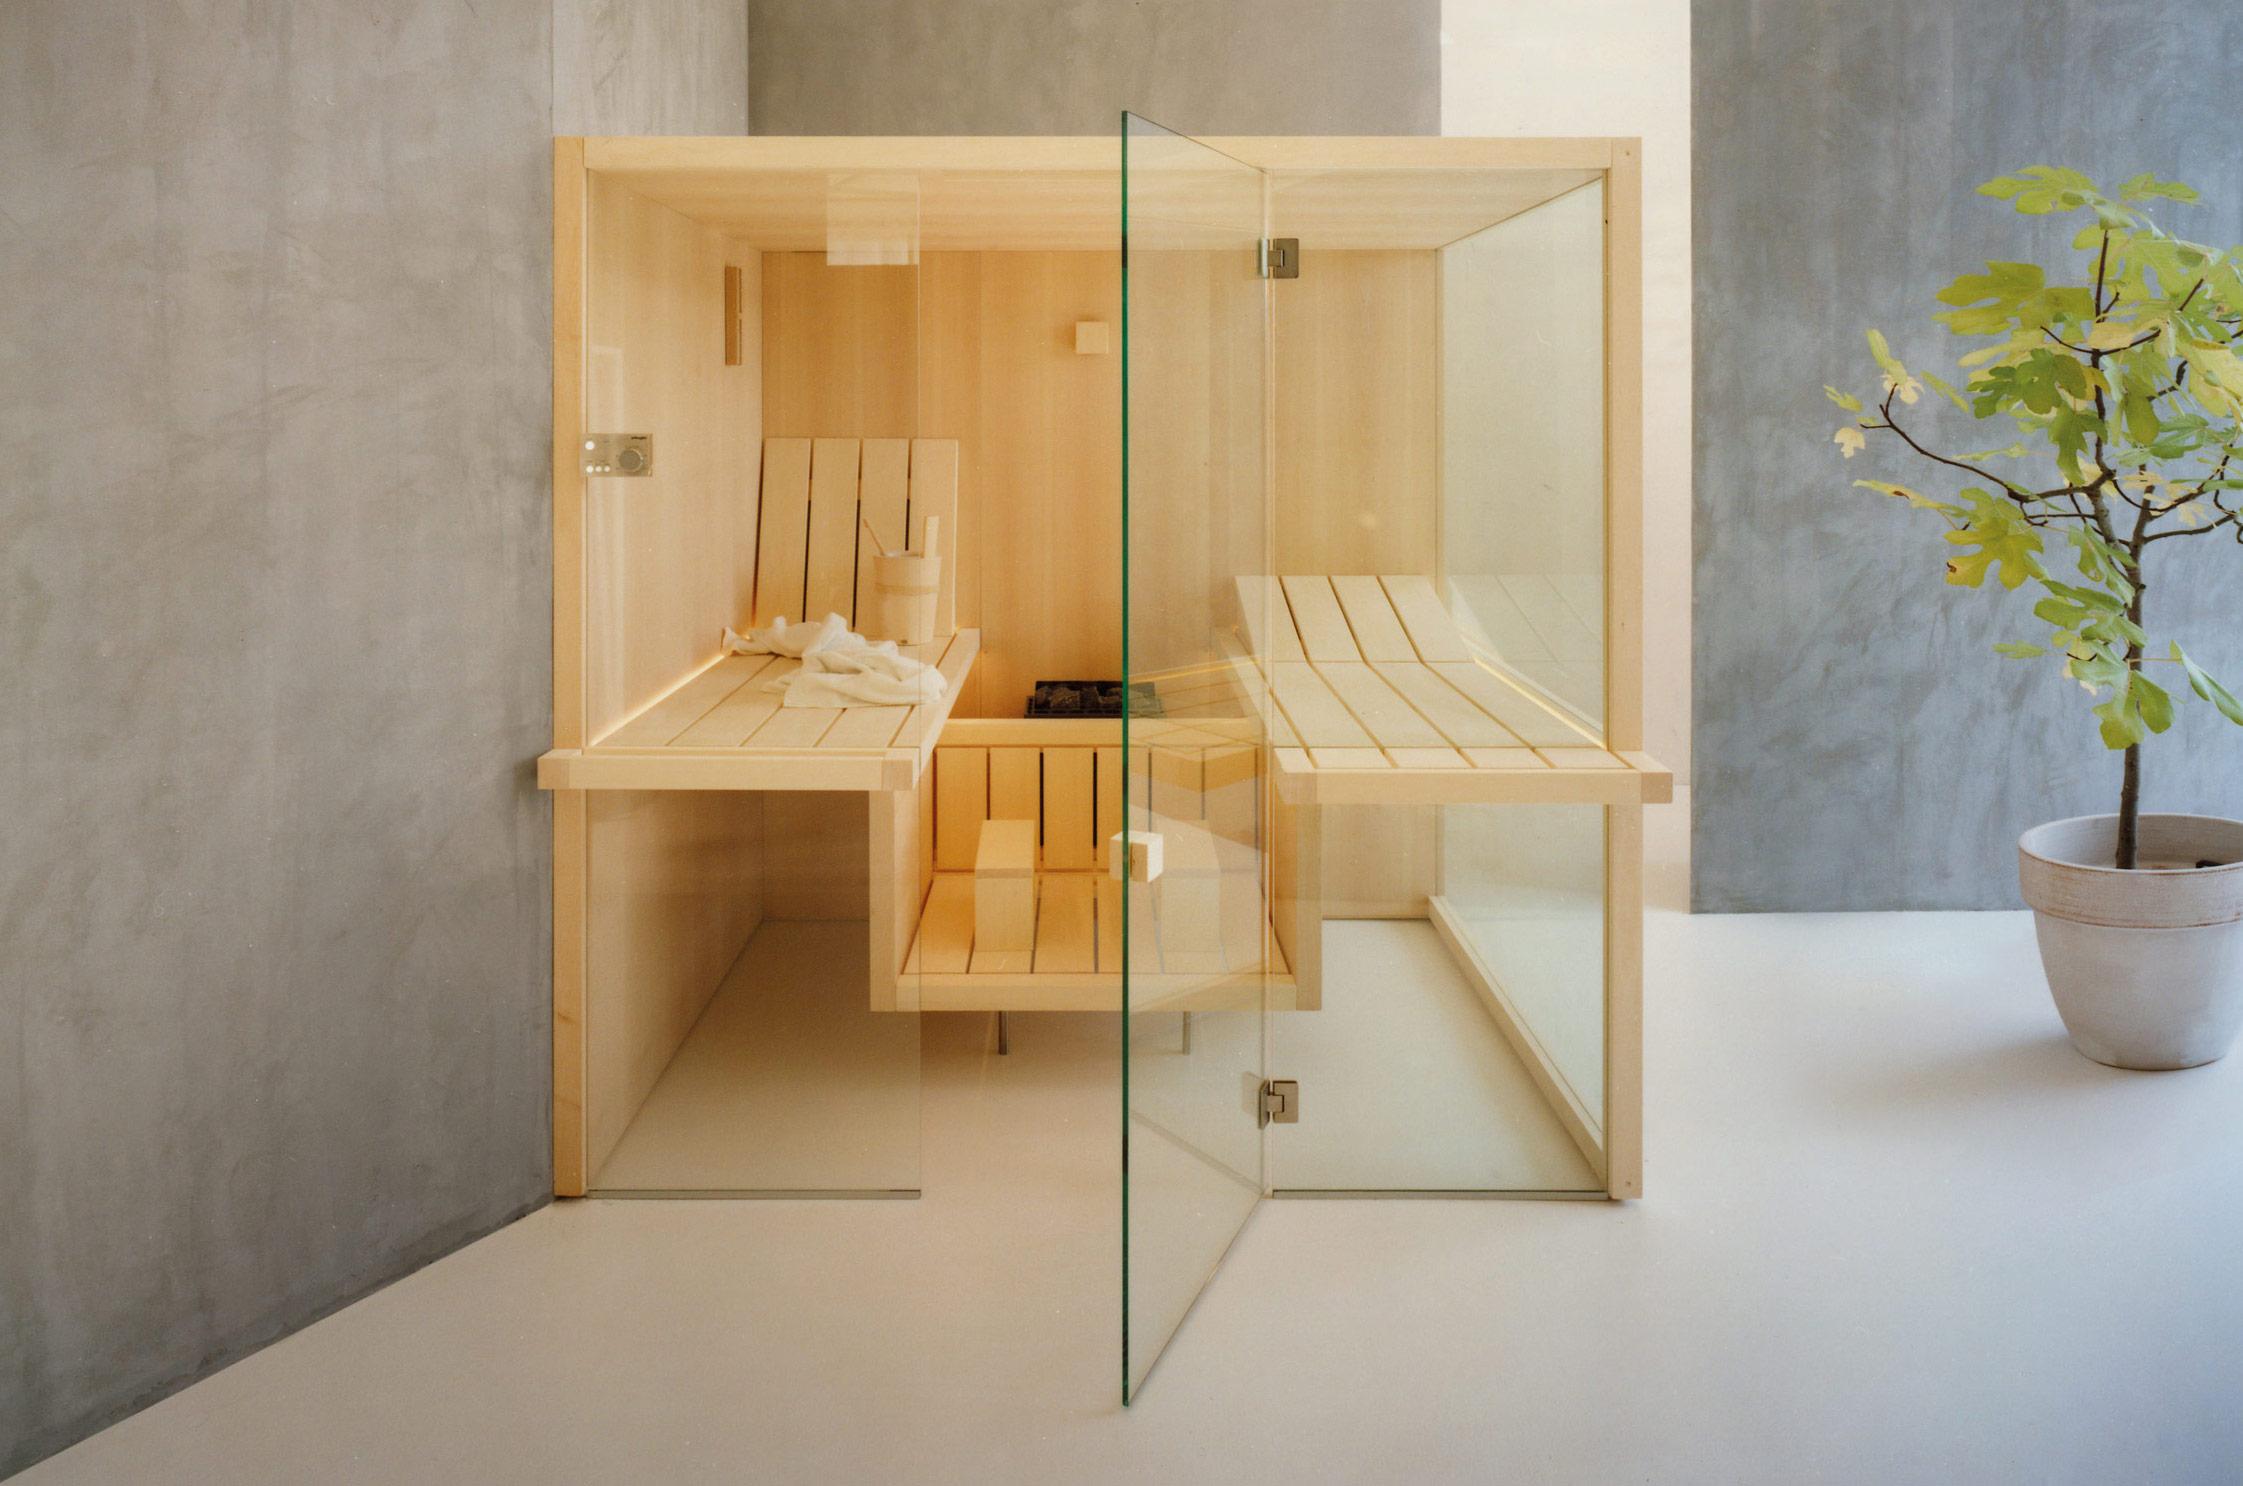 Sauna In Casa Consumi effegibi - sauna air